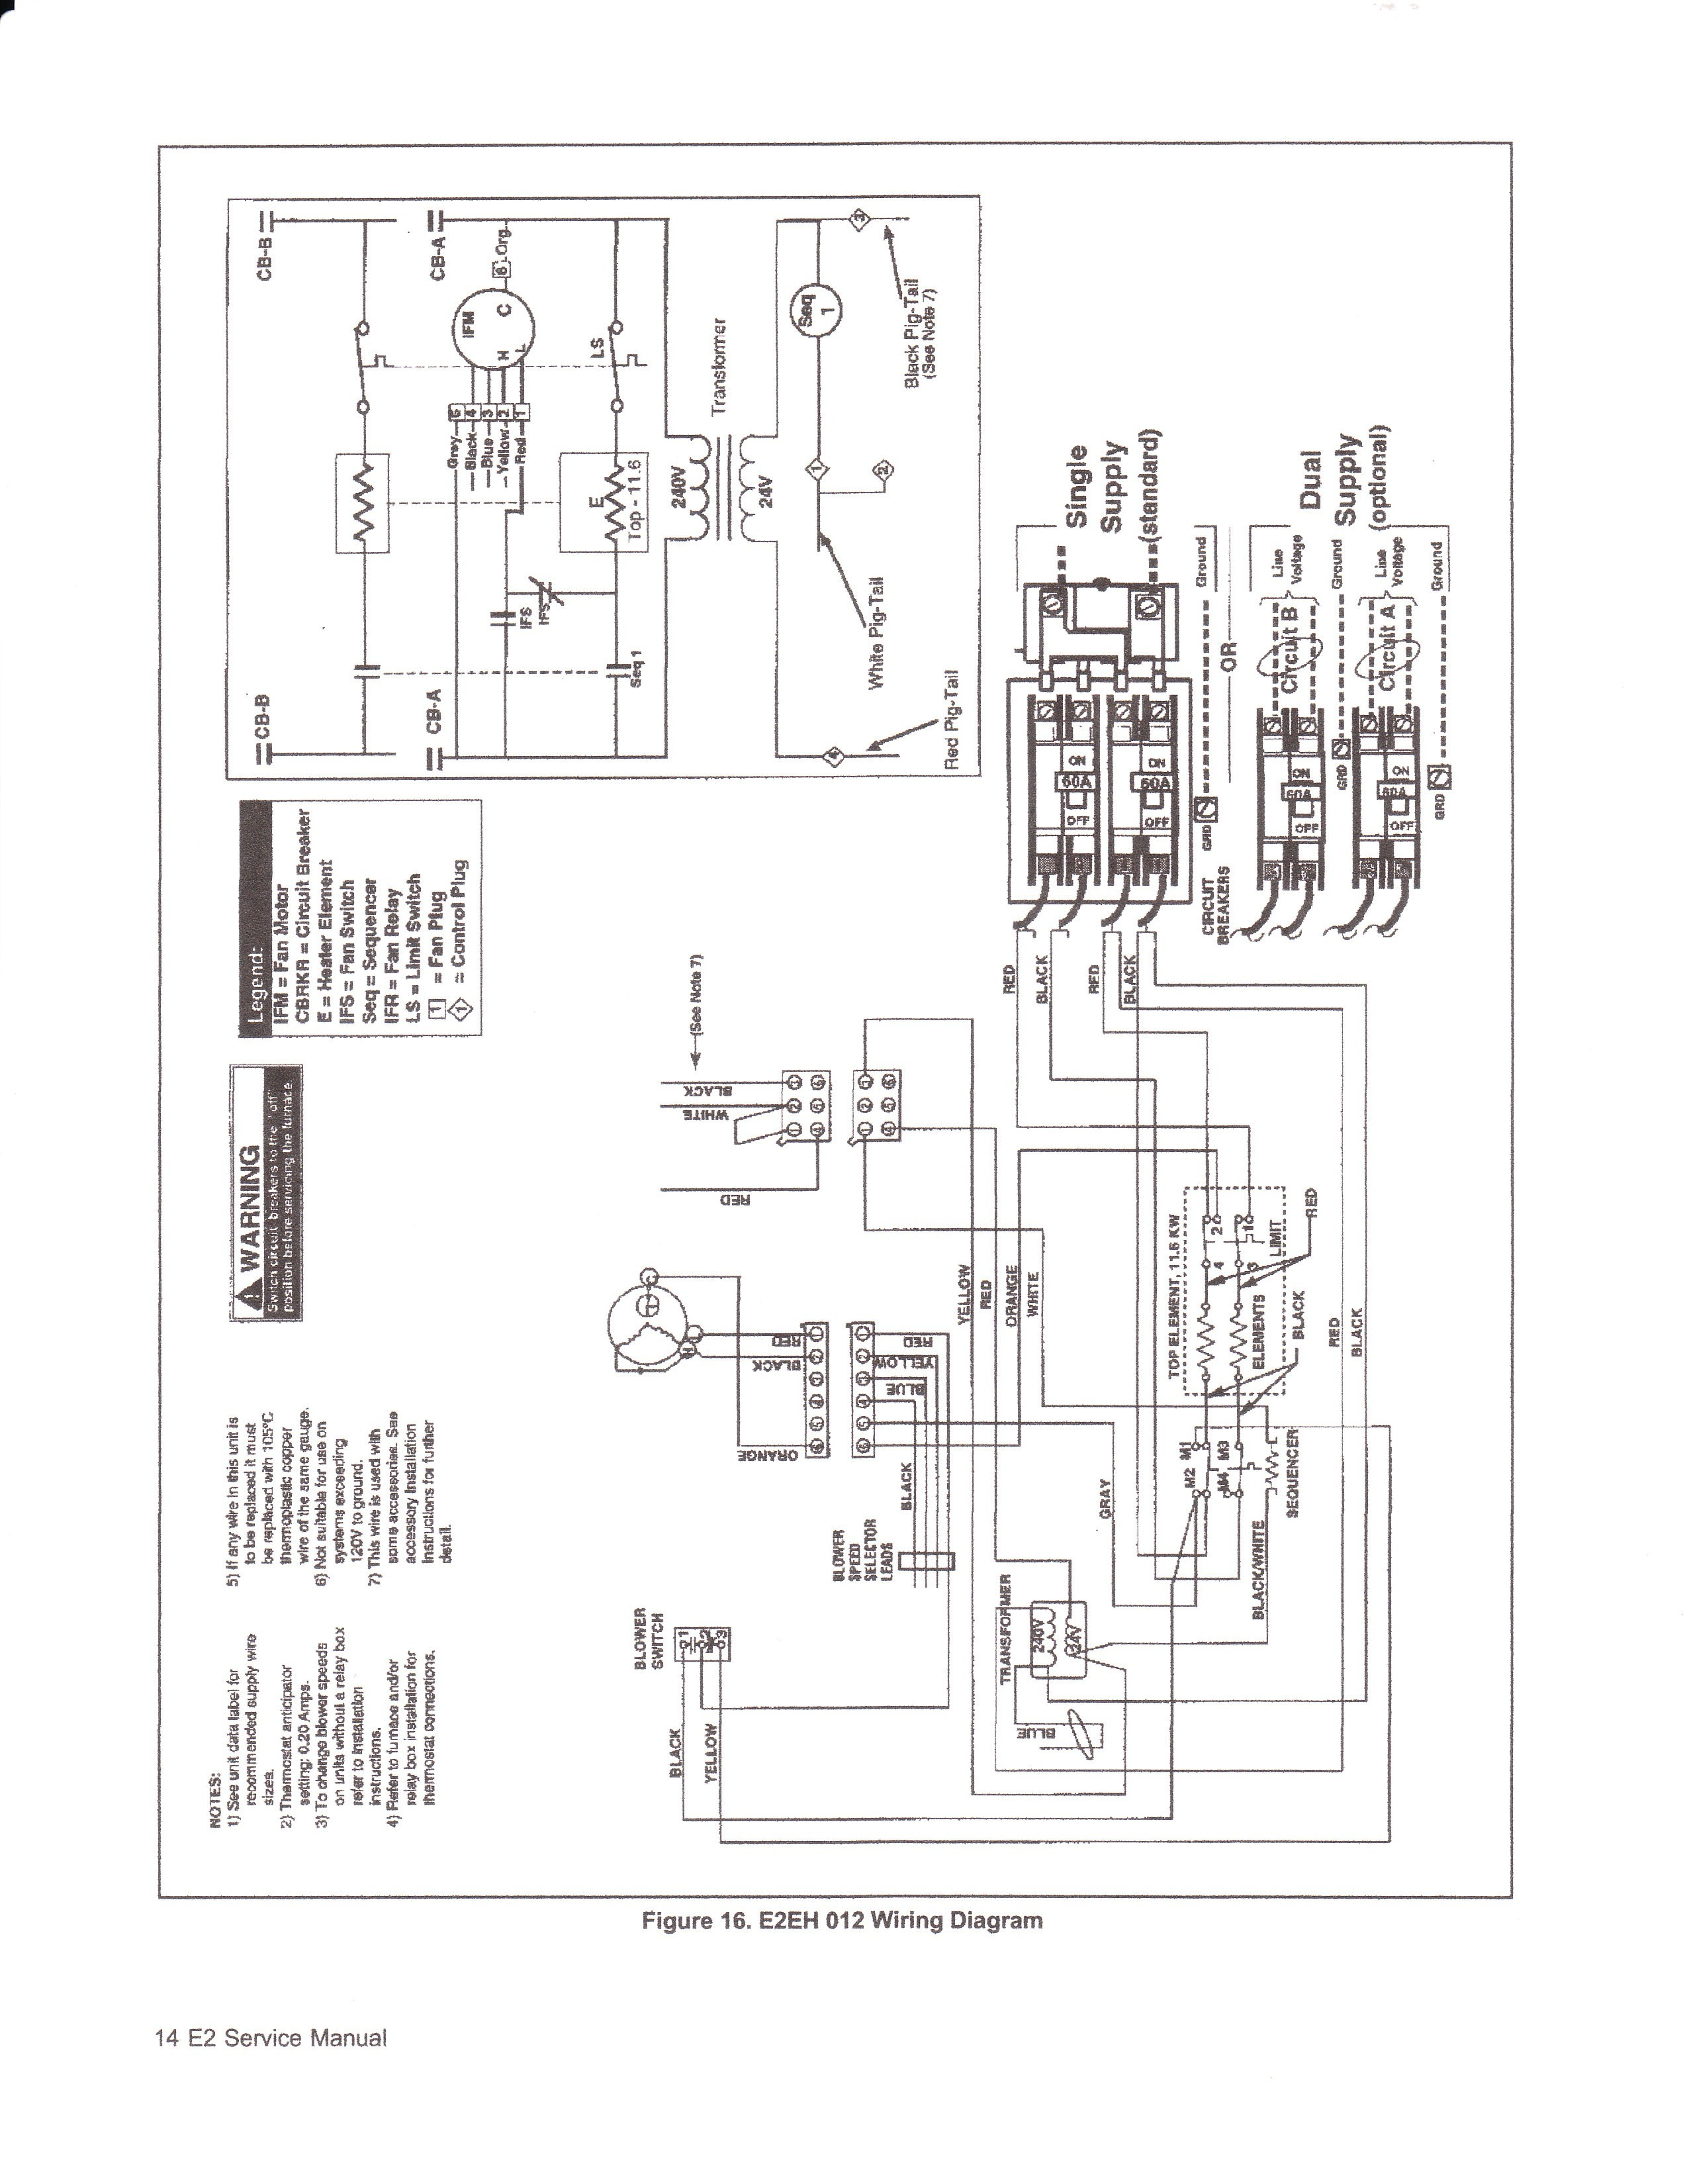 DC_3245] 015Ha Wiring Diagram Nordyne Get Free Image About Wiring Diagram  Schematic WiringPneu Rimen Gram Amenti Inoma Nful Mohammedshrine Librar Wiring 101